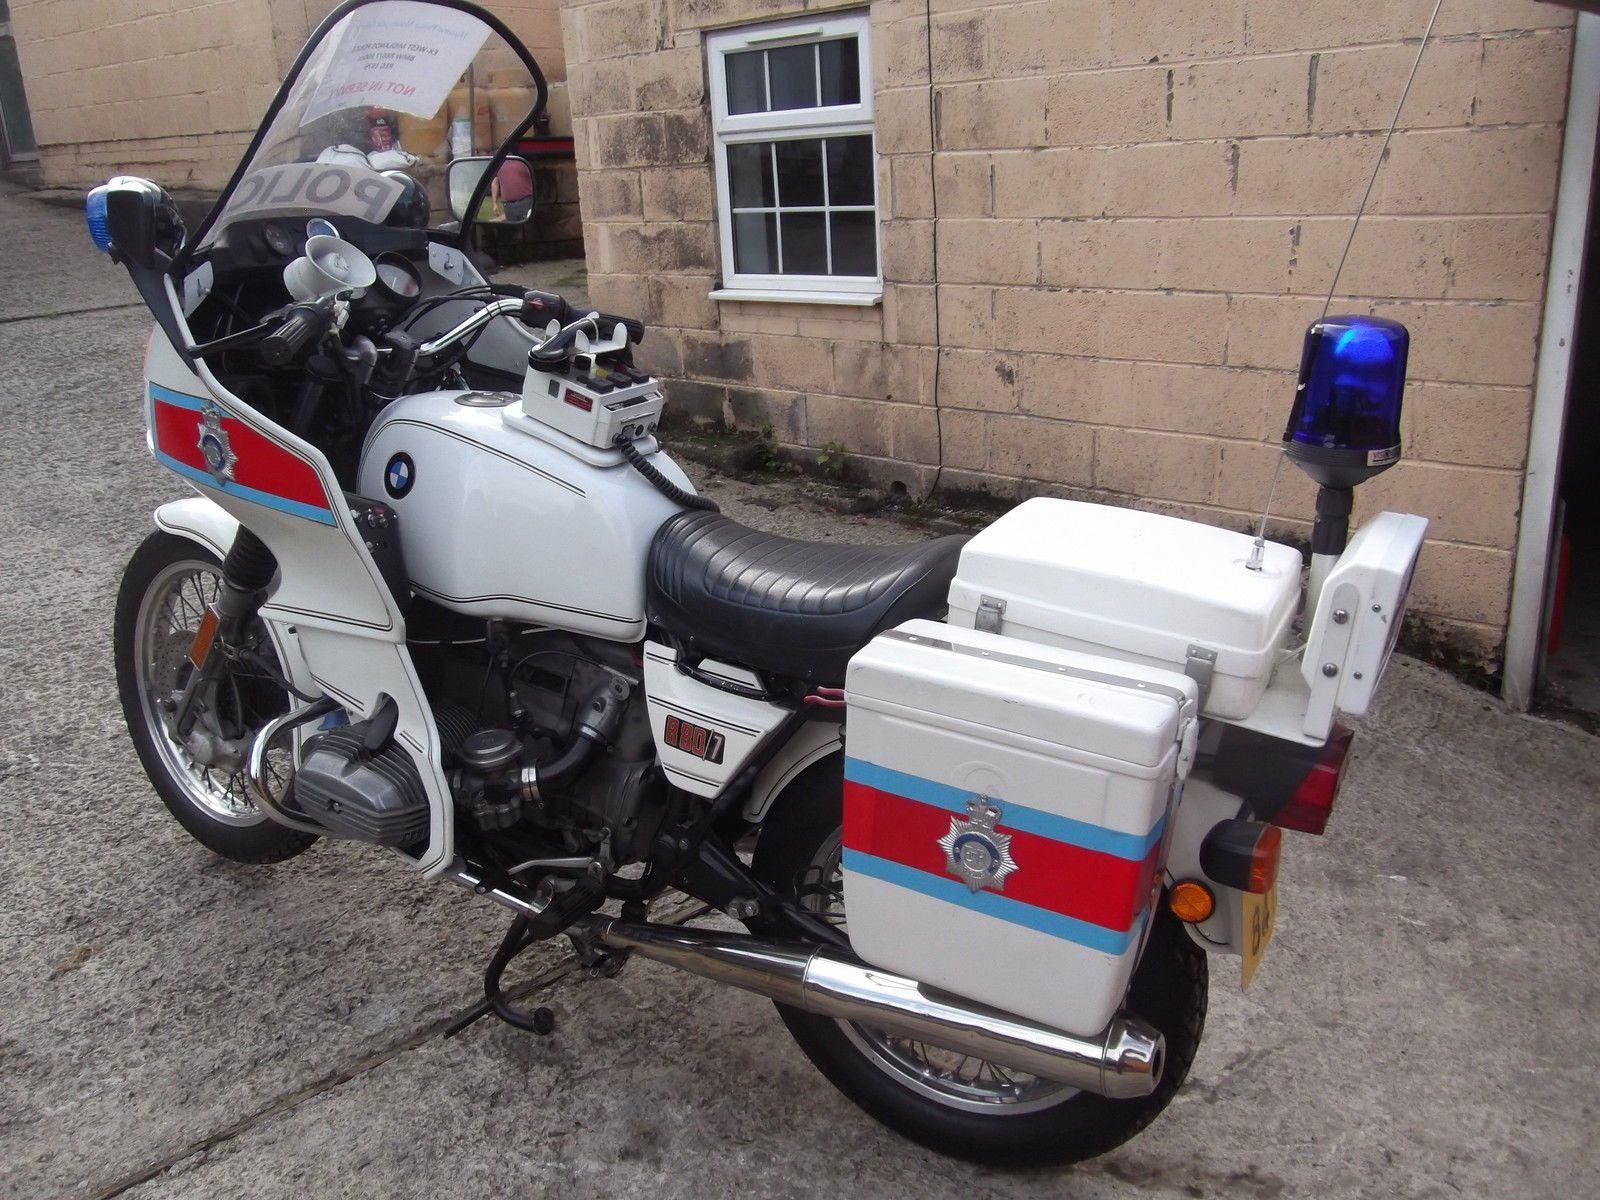 hight resolution of 1979 bmw r80 ex police motorcycle 800cc restored good runner poss film work ebay